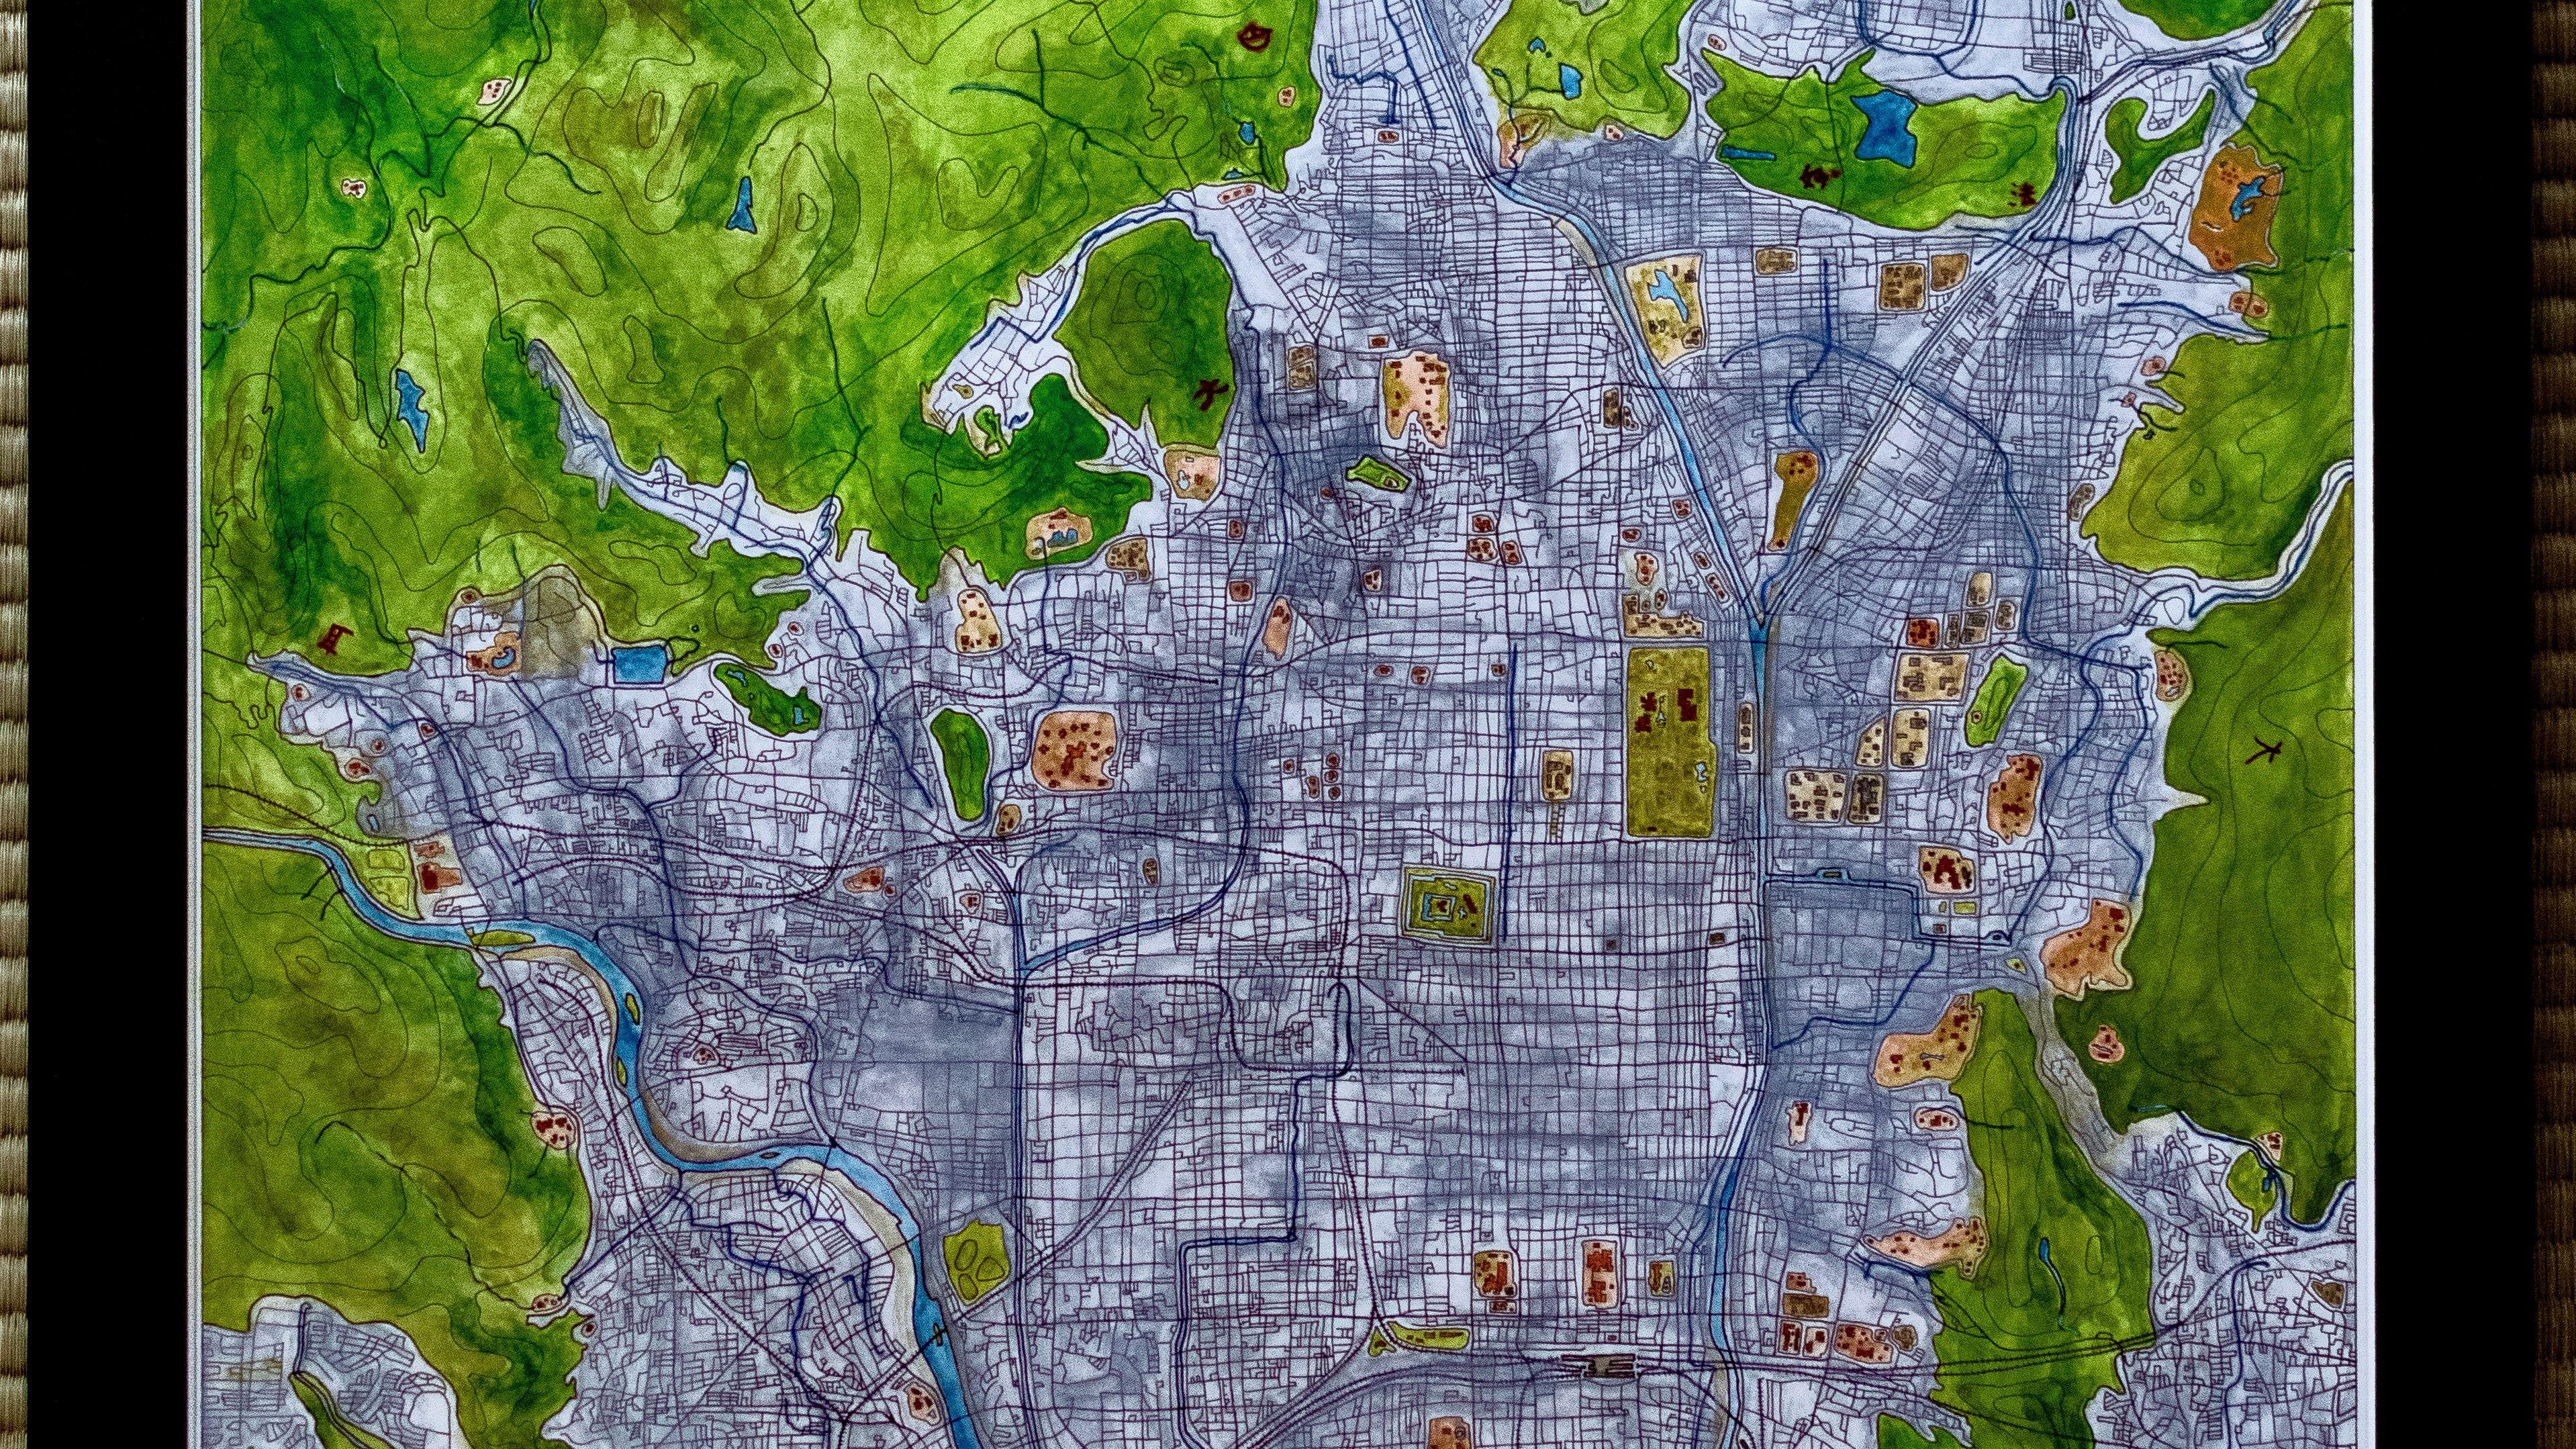 #kyoto #cartography #streetmap #japanmap #mapofjapan #inkandwatercolor #staedler #daimonji #japan #mapposter #kickstarter #goldenpavilion #cartographer #kyotocity #miyako #watercolormap #streetmap #handmademap #mapmaking #mapdesign #illustrativemap #karte #mapofkyoto #kyotomap #地図 #京都 #大文字 #水彩画 #金閣寺 #手作り #京都の地図 #みやこ